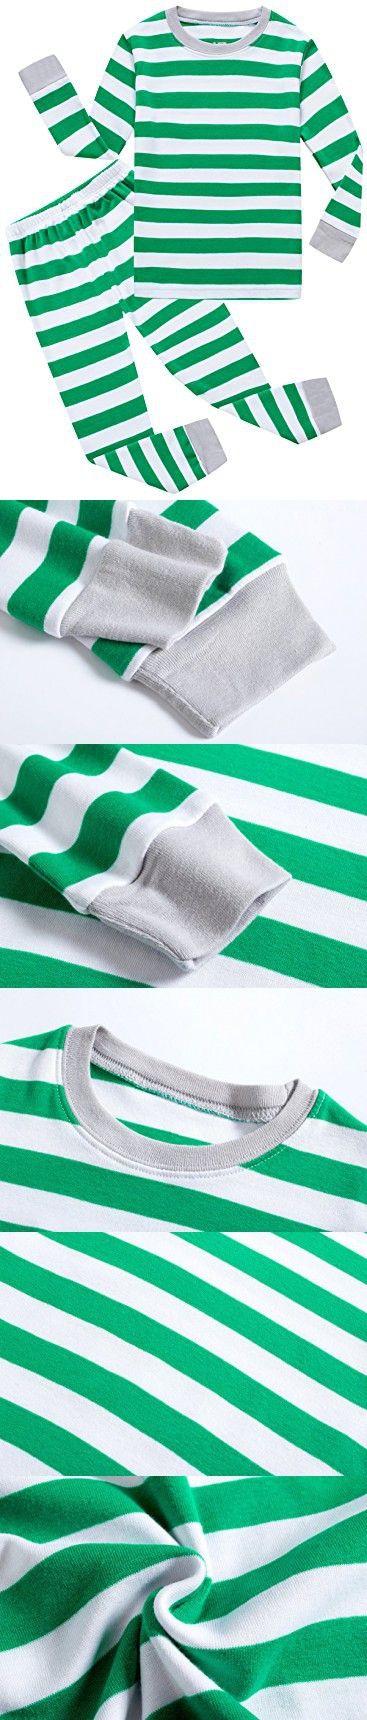 Family Feeling Striped Little Boys Girls Christmas Pajamas Set 100% Cotton Pjs Green Size 6-12Months